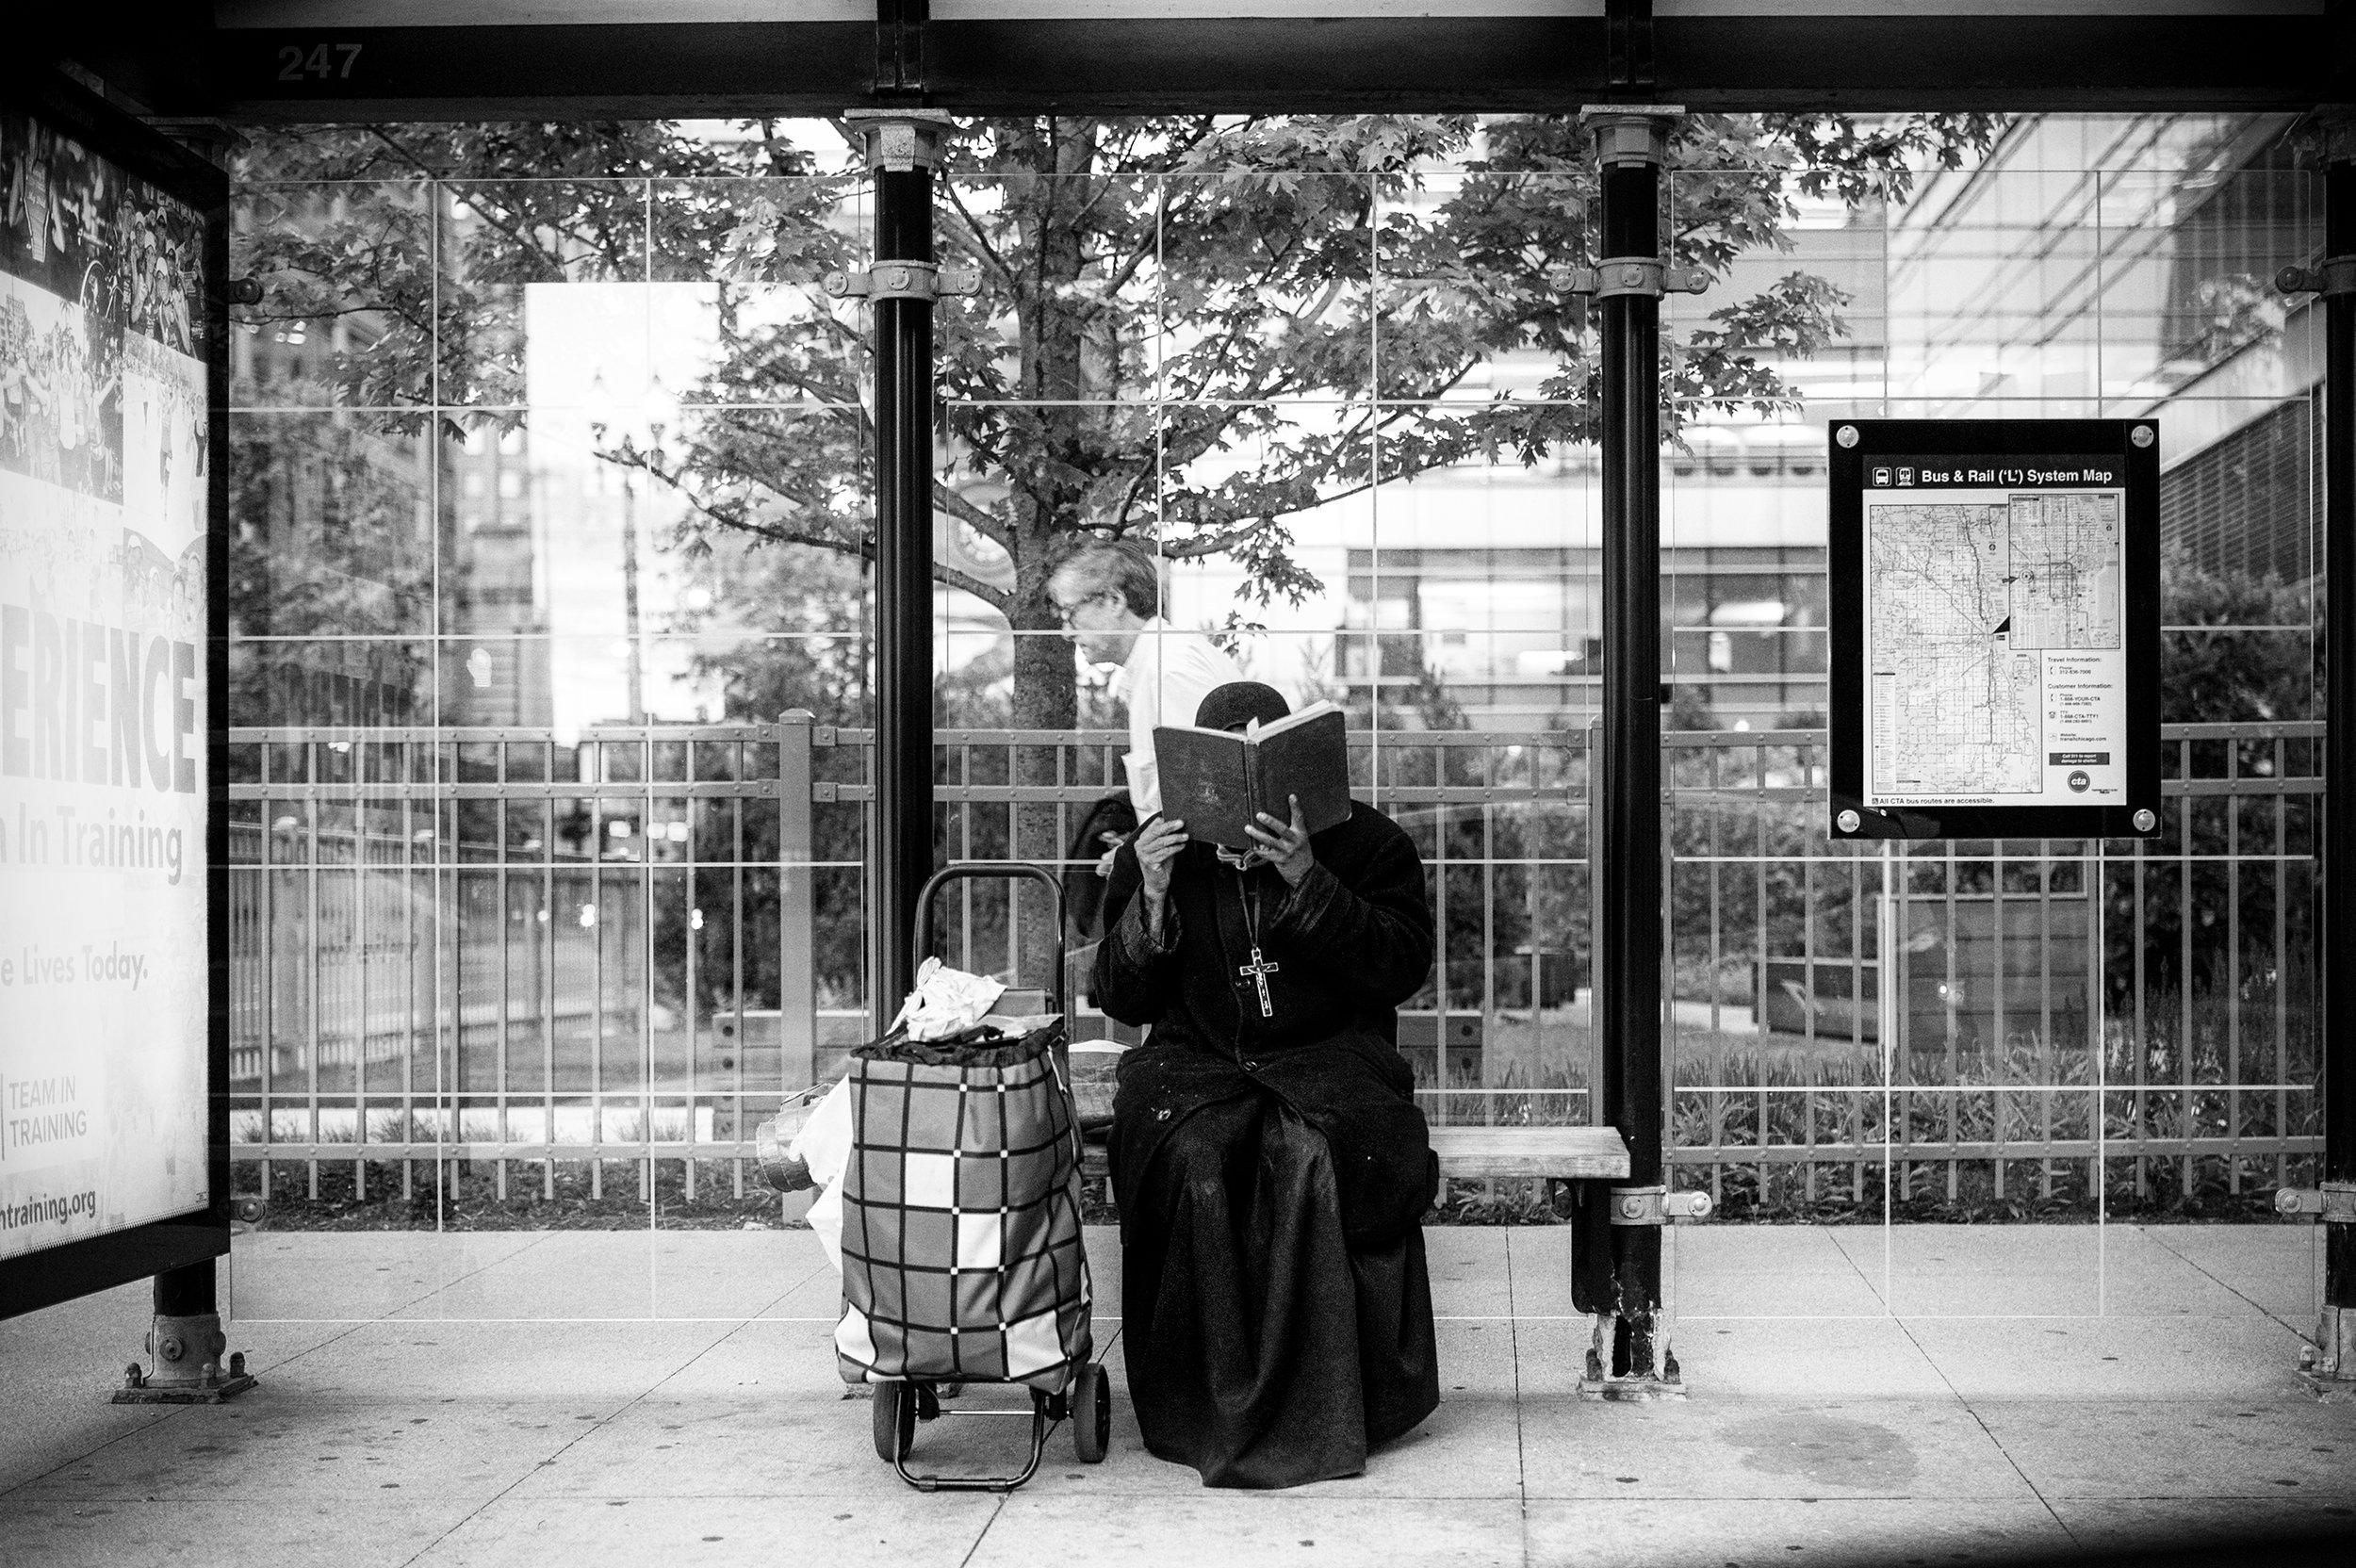 THE CATHEDRAL OF THE HOMELESS SAINT | © PRESTON LEWIS THOMAS